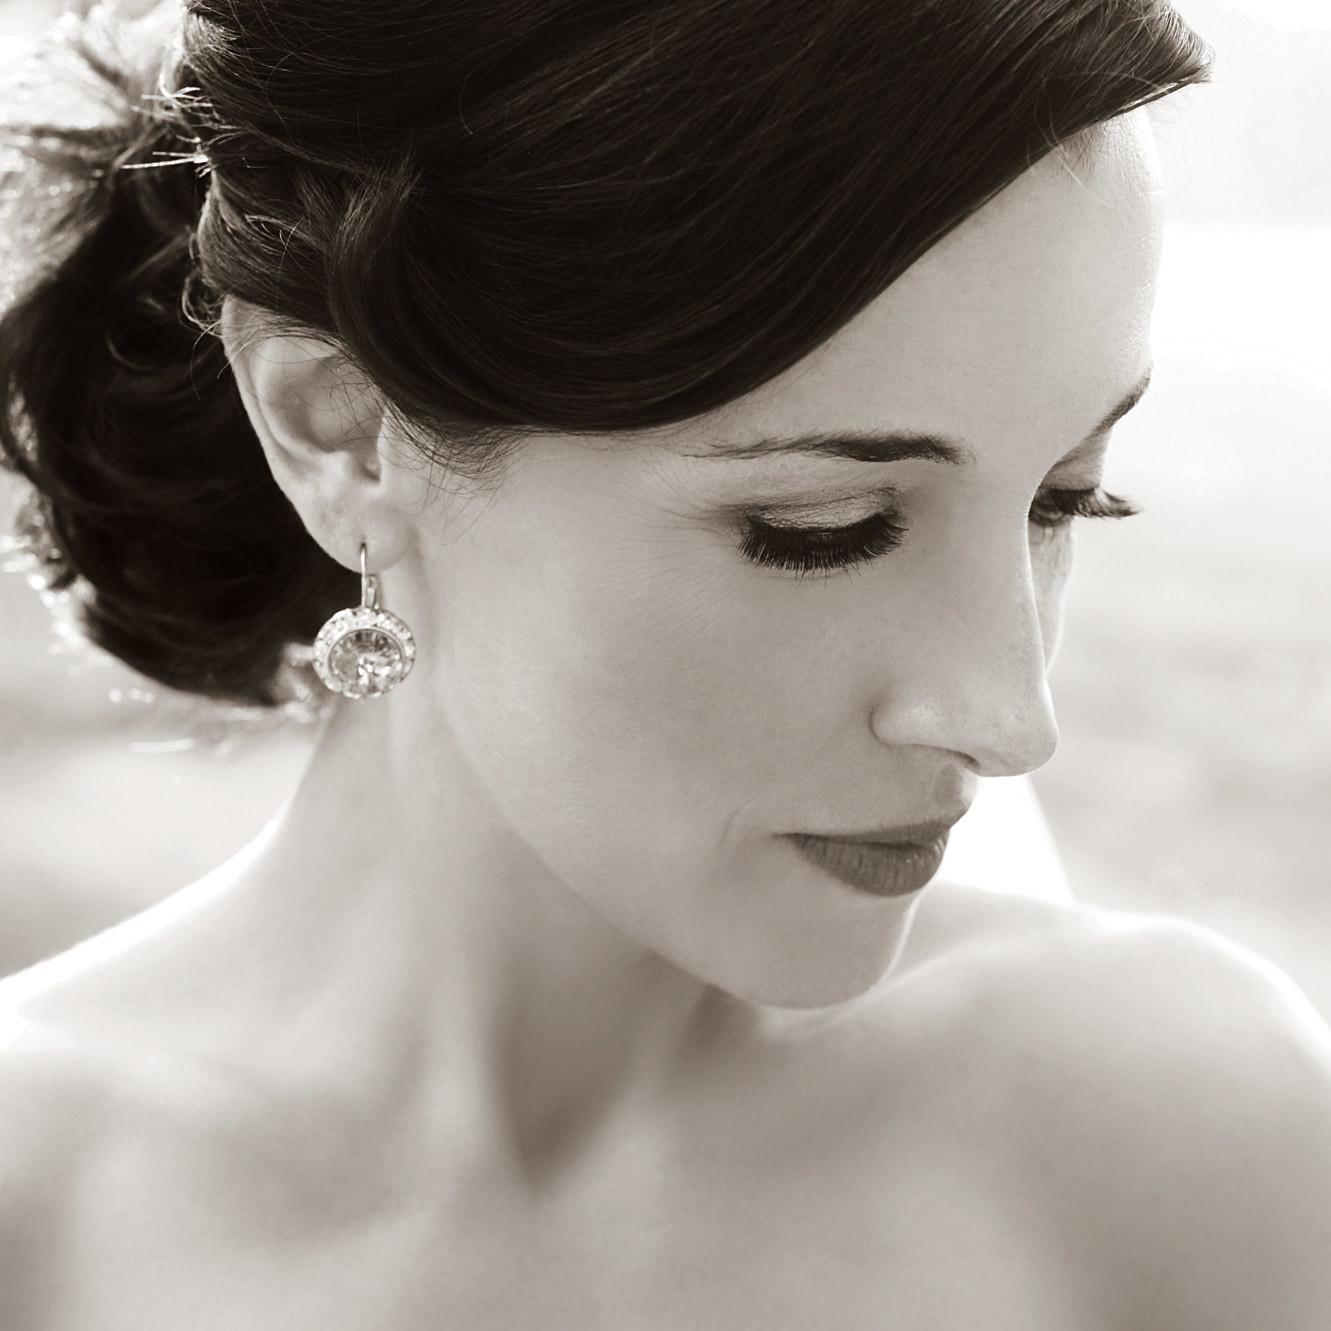 Marthastuart Marthastuart: How To Pose For Wedding Pictures